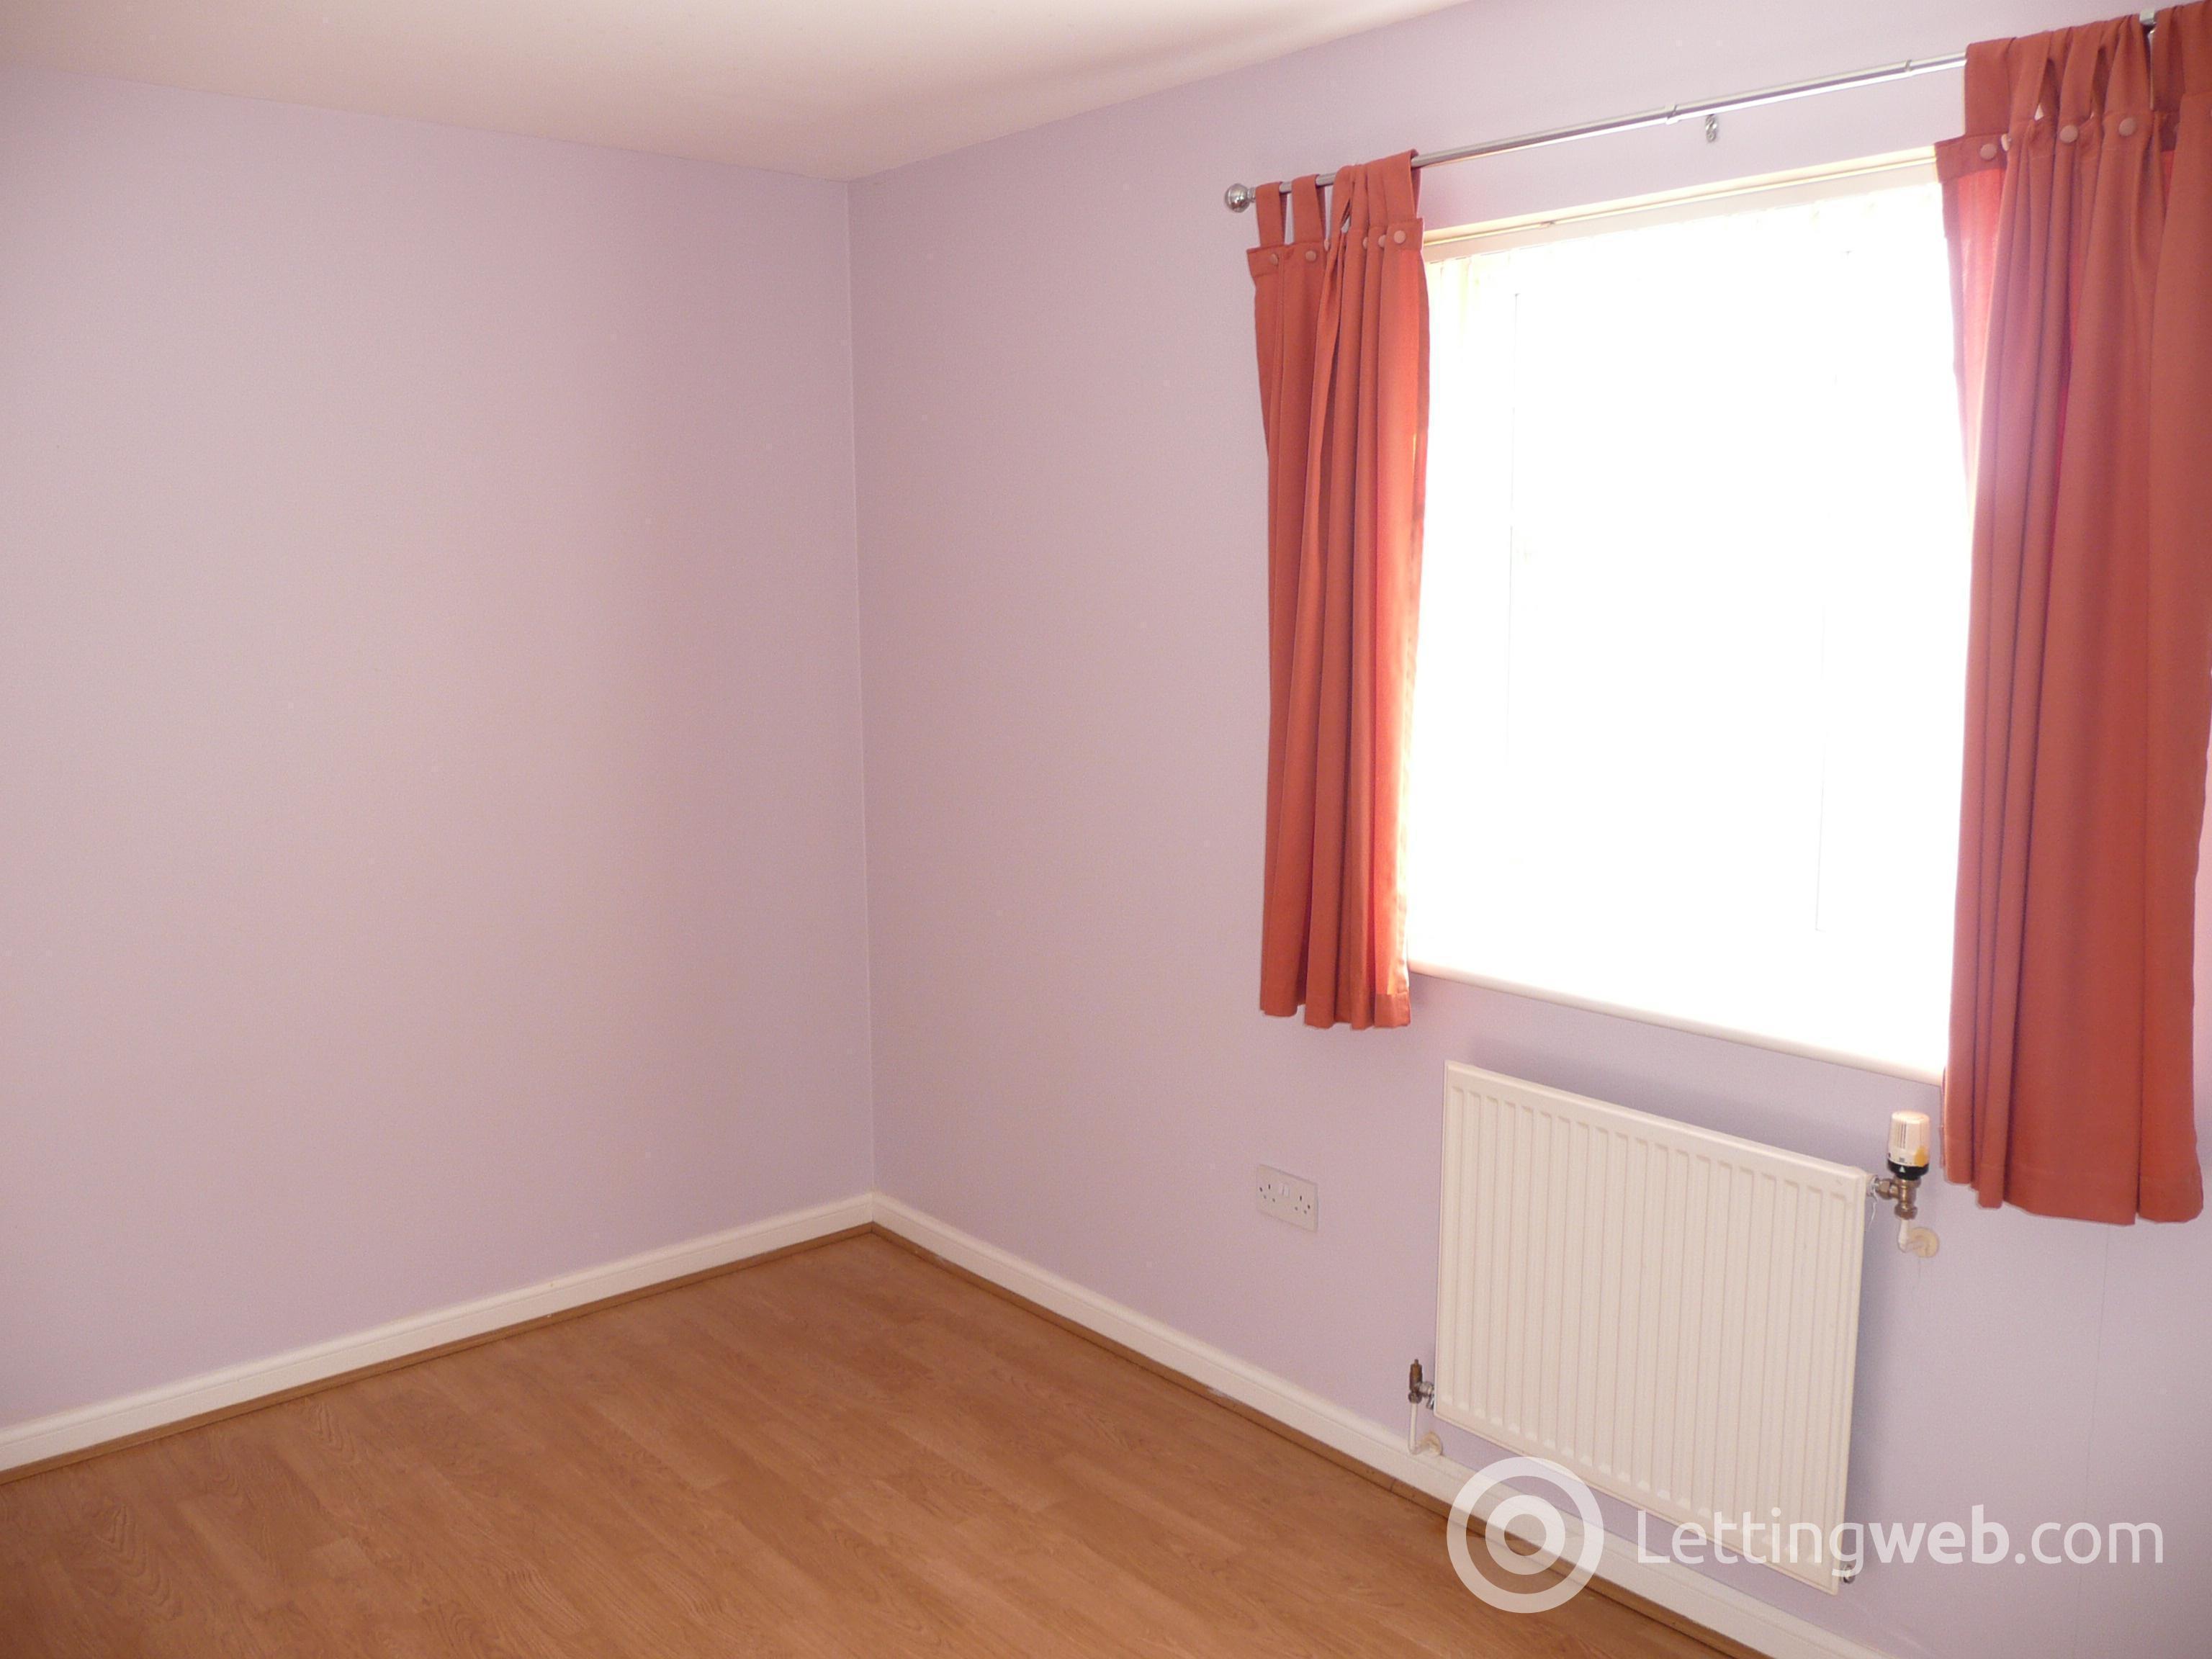 Property to rent in 35 innellan Drive, Kilmarnock, KA3 1SS